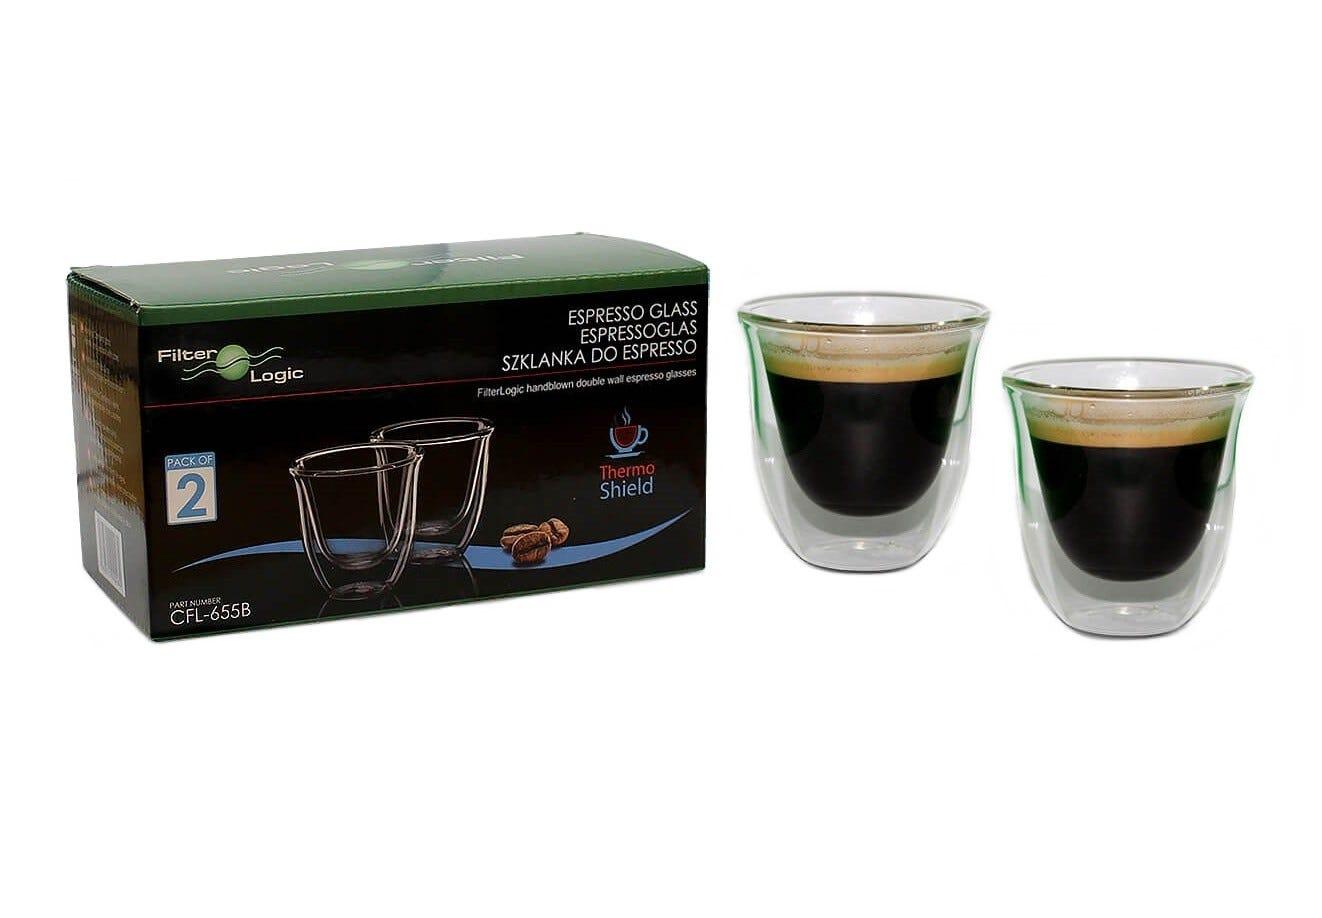 FilterLogic CFL-655B Thermoshield Double Wall Espresso Coffee Glasses (Twin Pack)